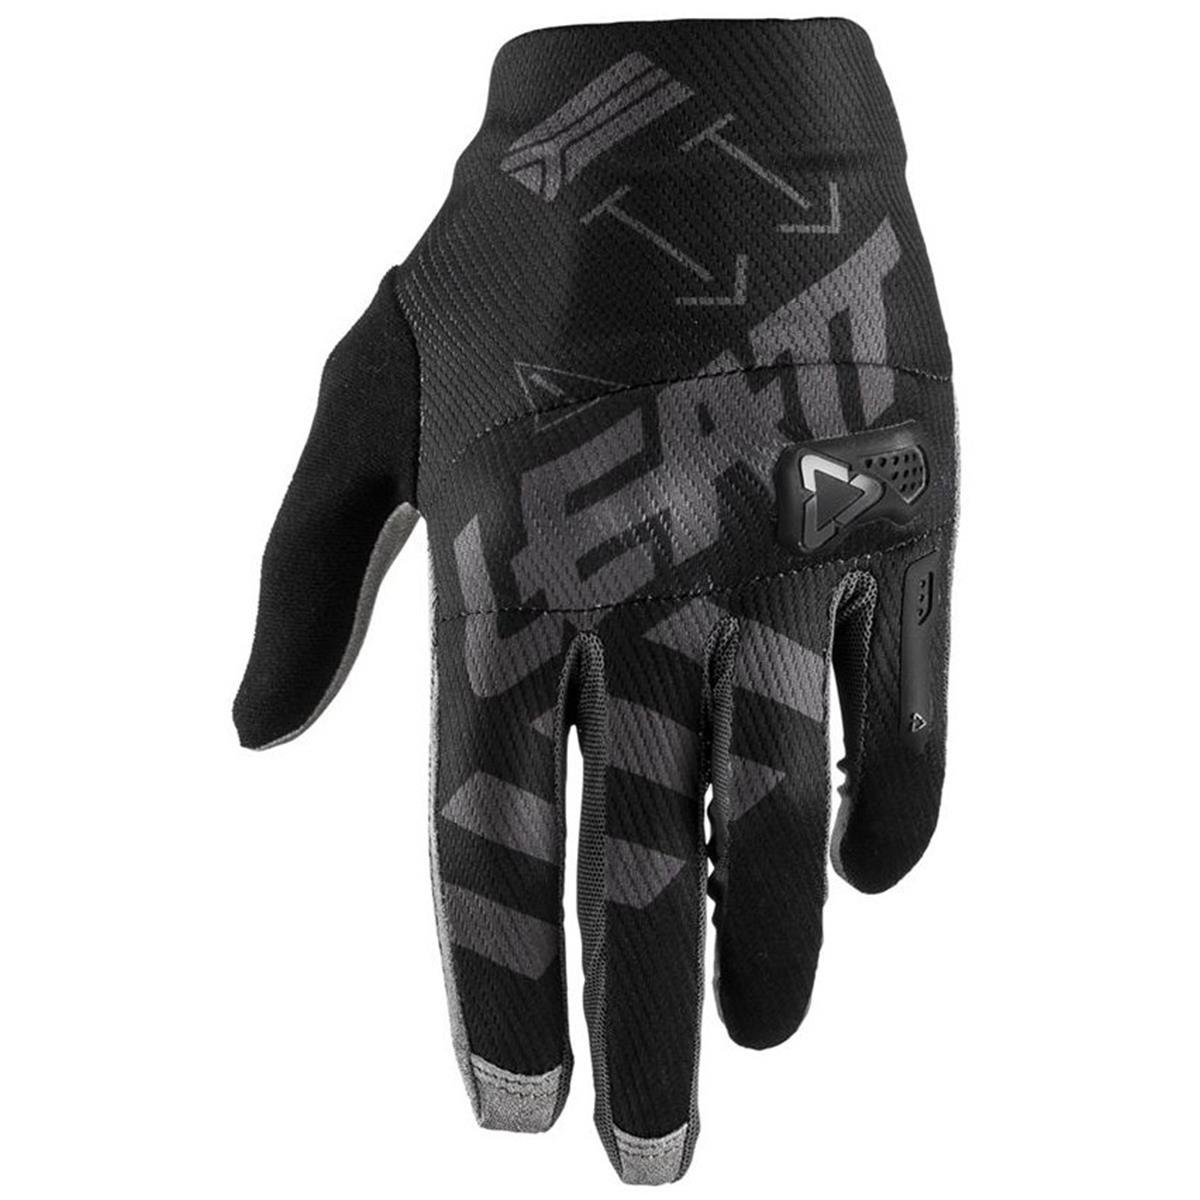 Leatt Bike-Handschuhe DBX 3.0 Lite Schwarz